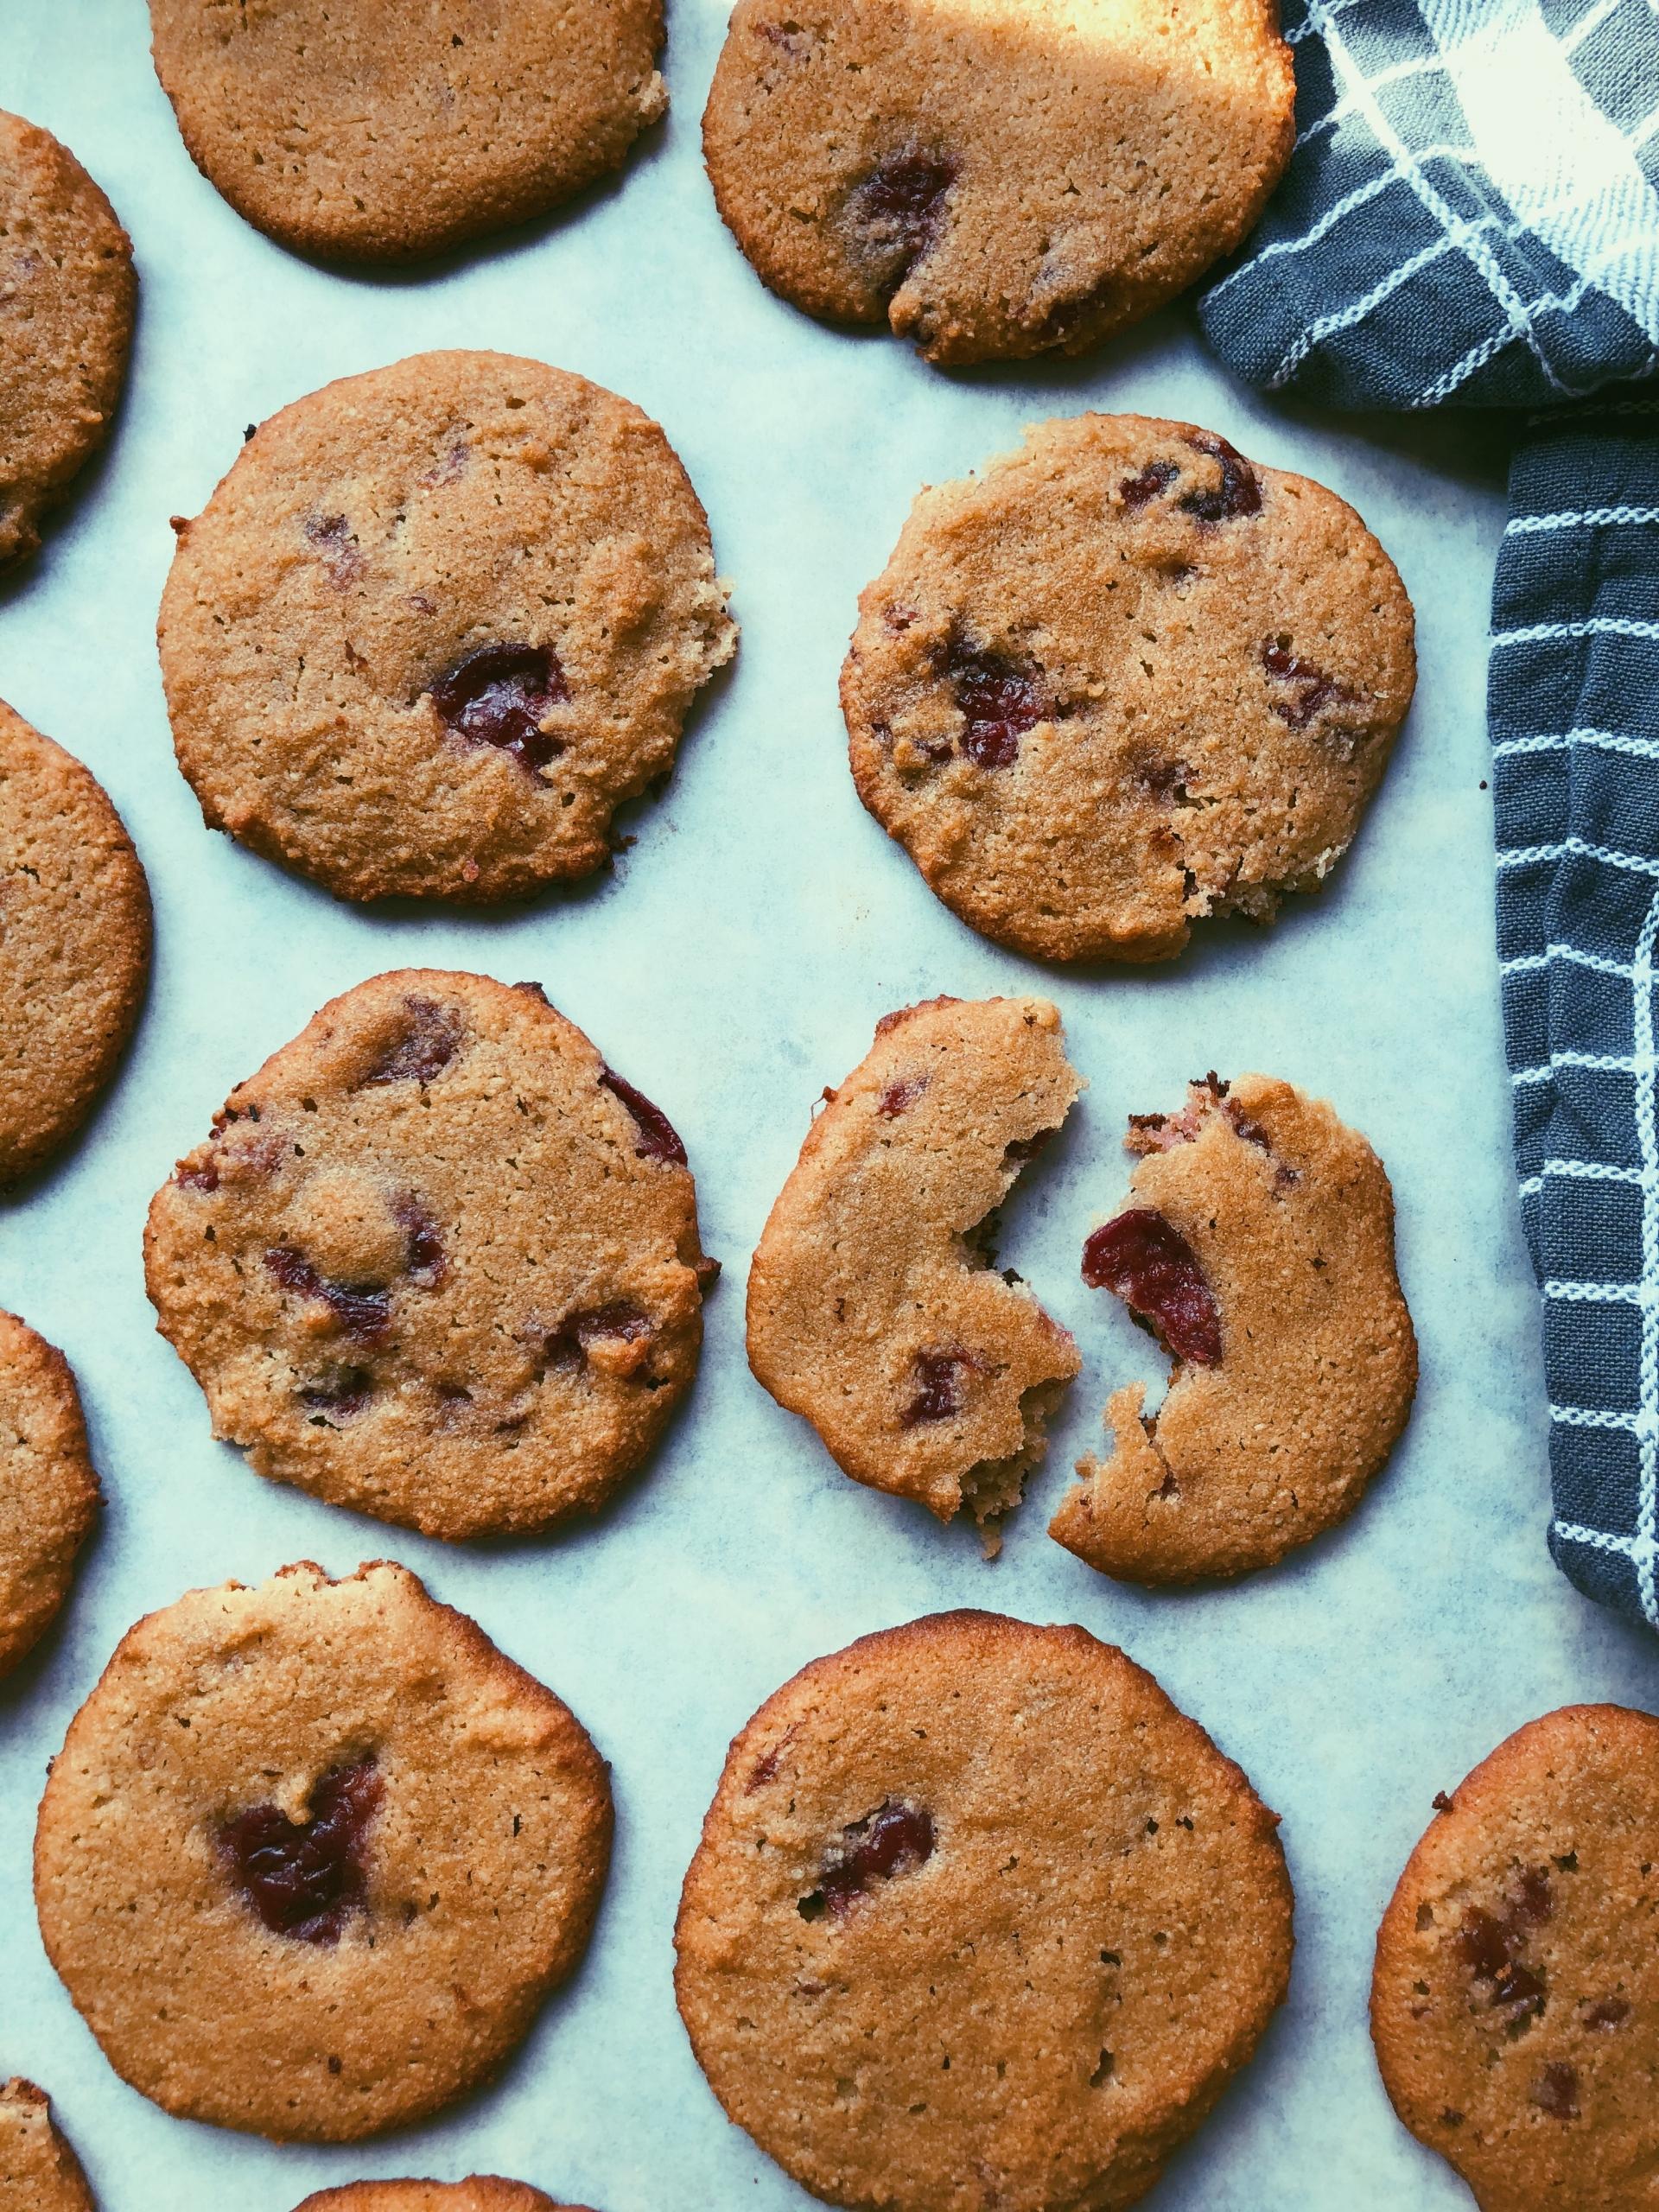 cherry pie cookies (grain free, scd diet, almond flour)